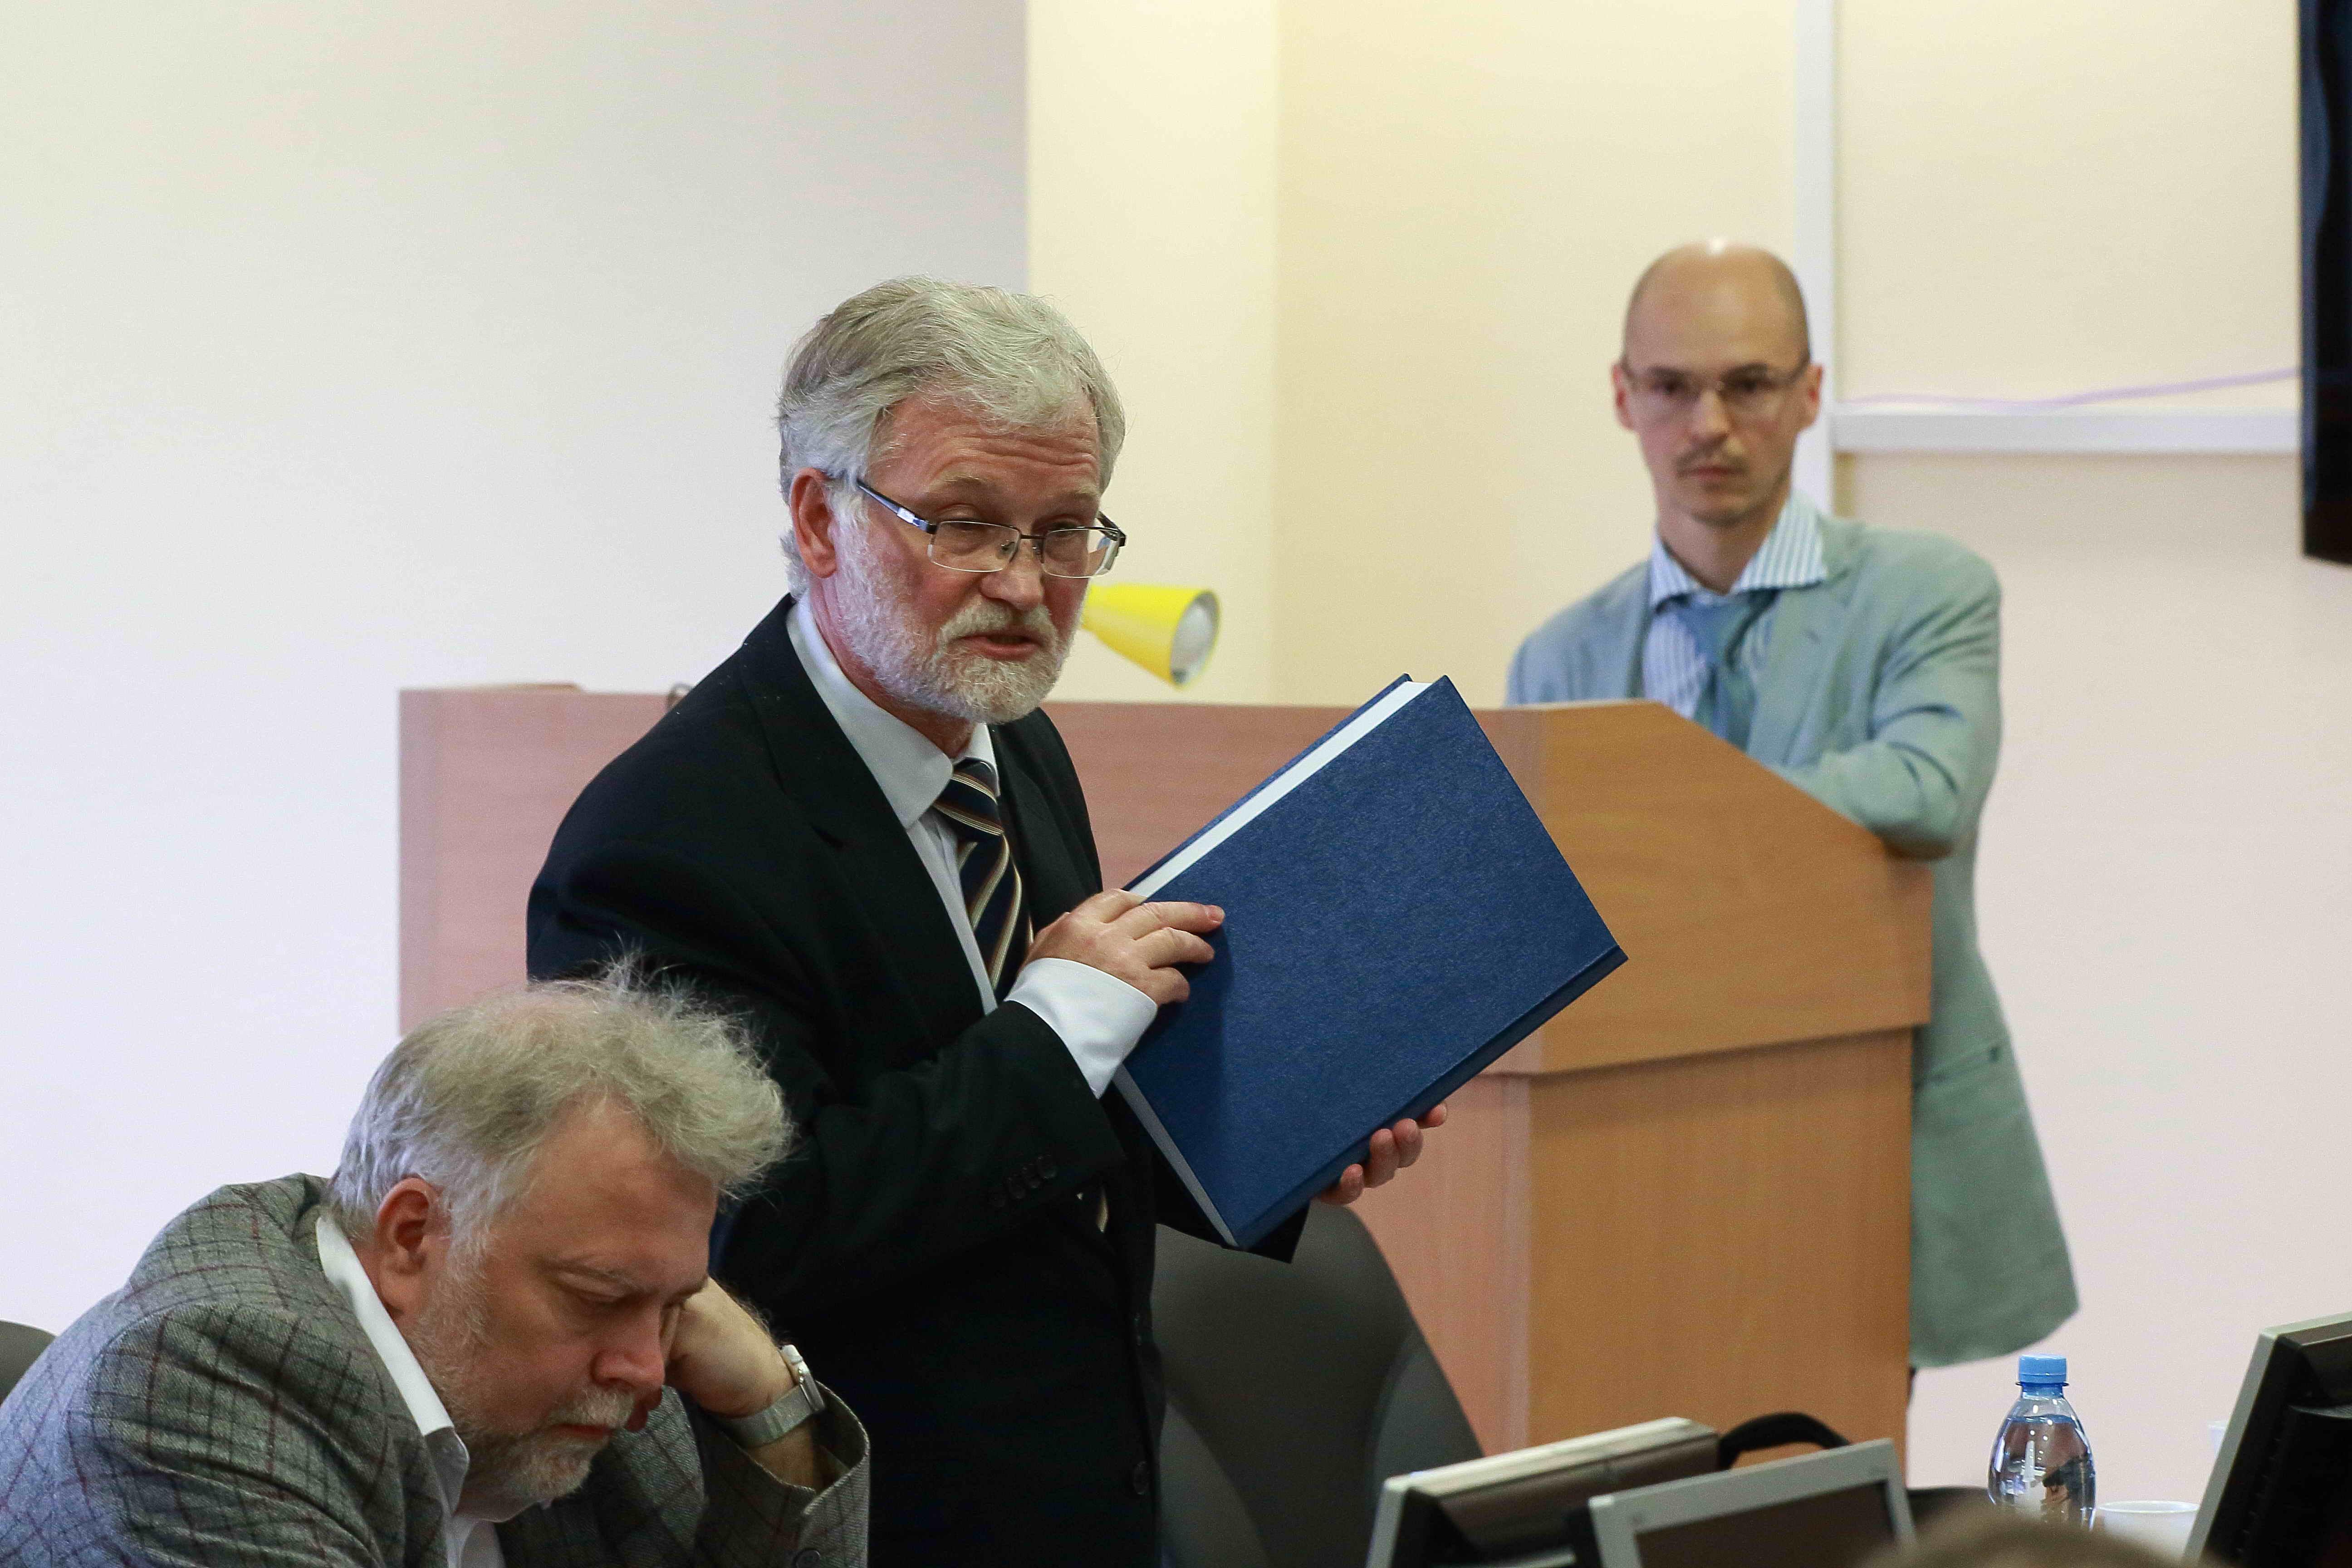 Защита докторской диссертации Д В Волкова Философский факультет  view the full image